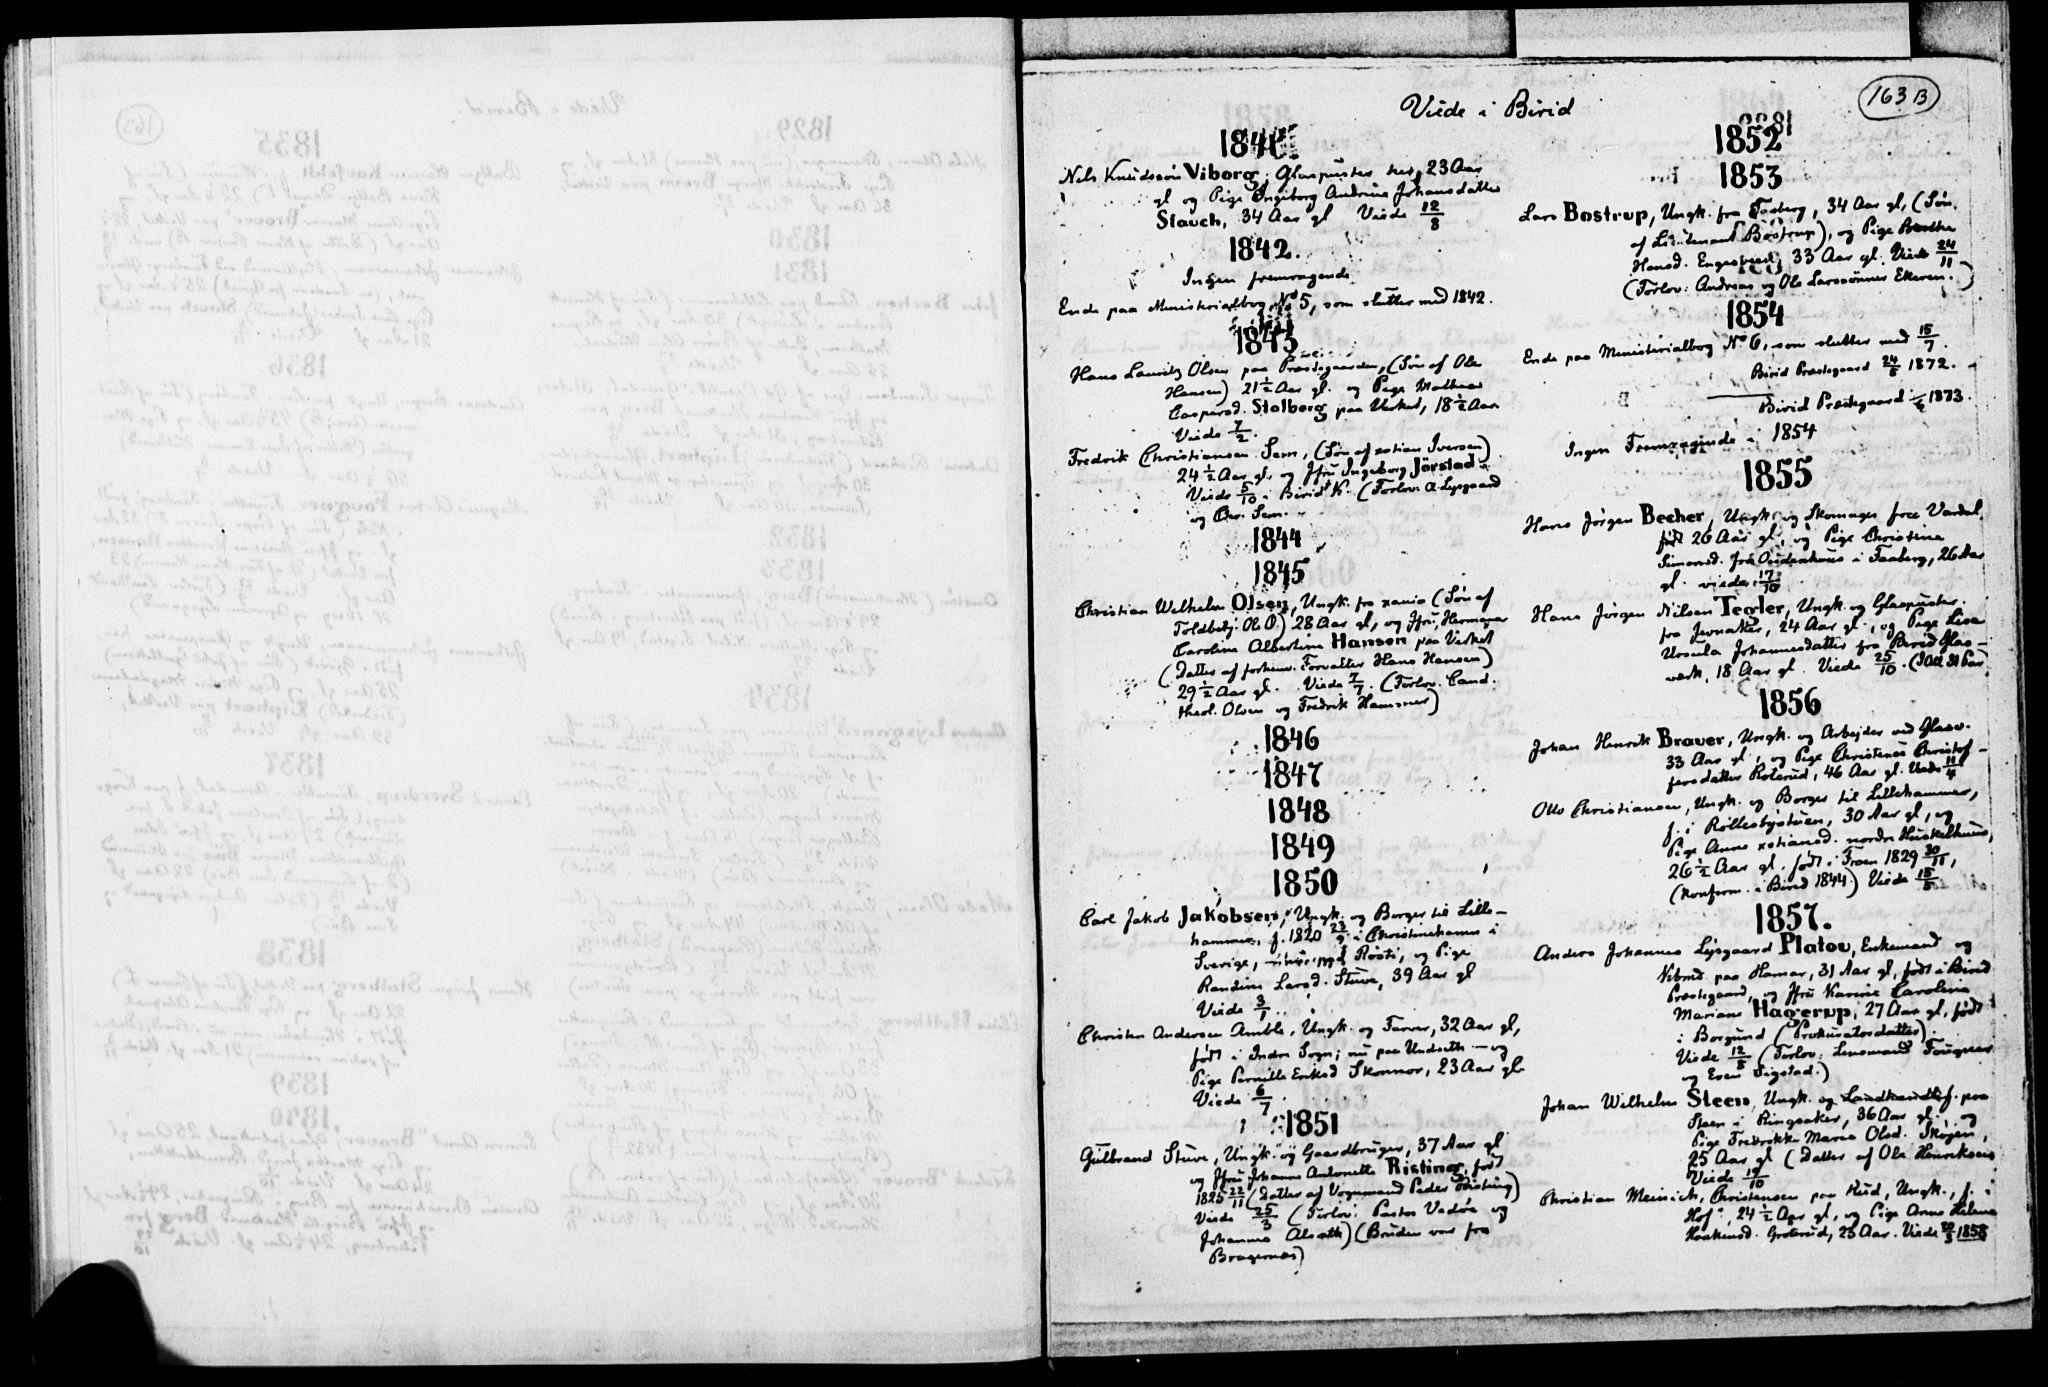 SAH, Biri prestekontor, Ministerialbok, 1730-1879, s. 163b